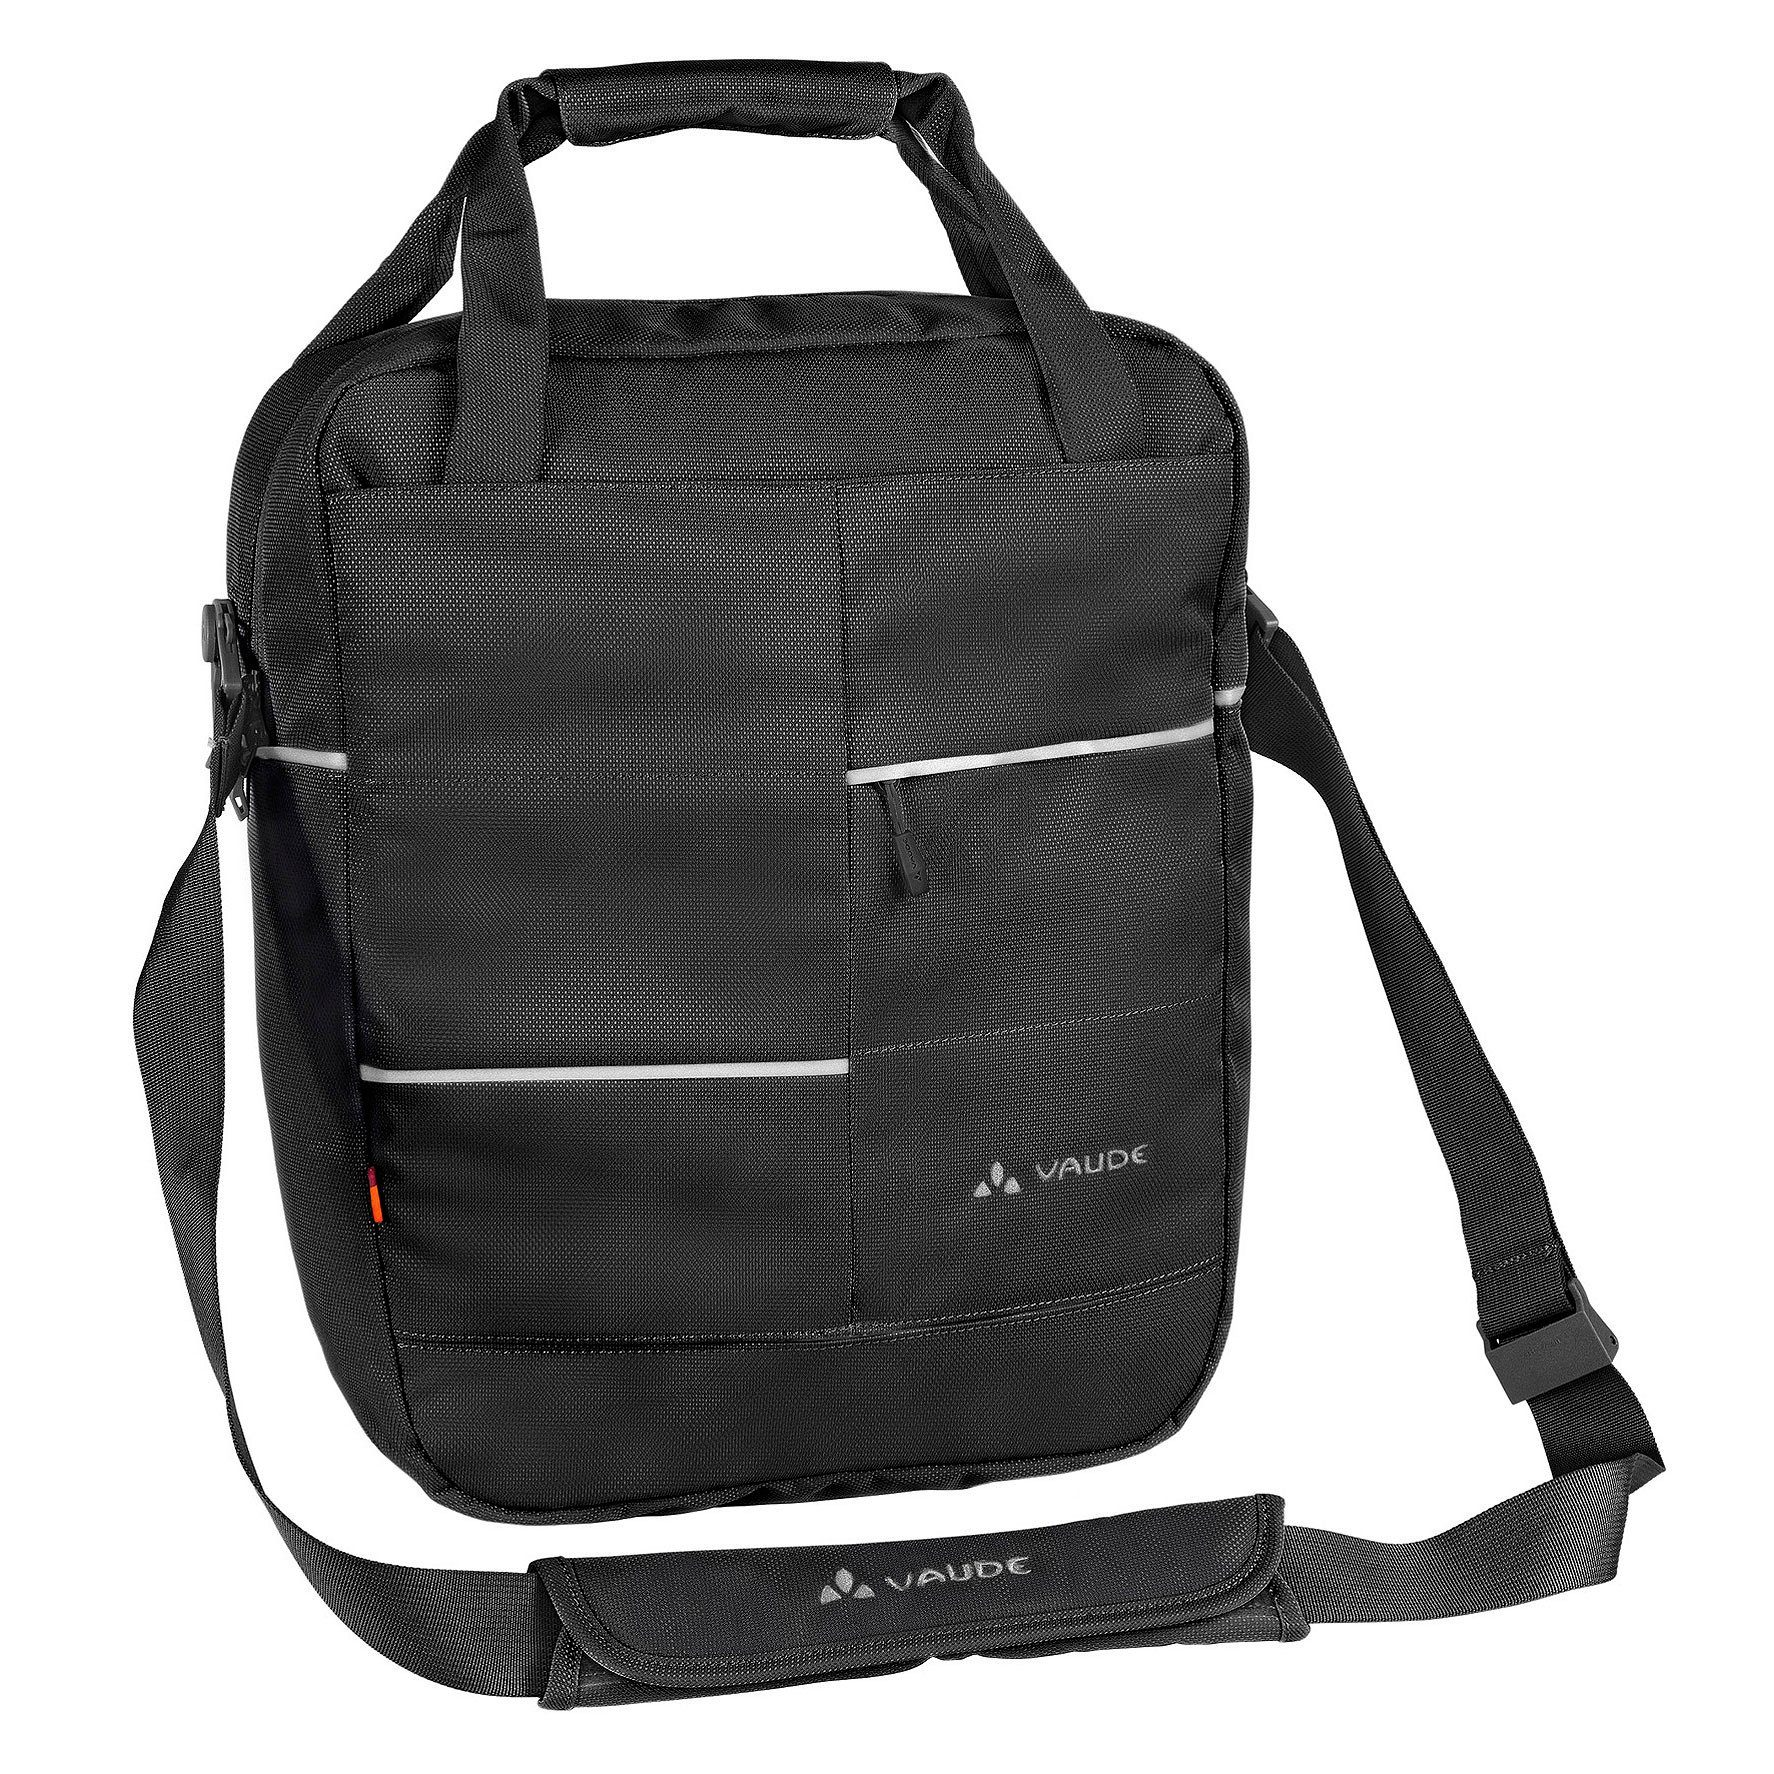 VAUDE Gepäckträgertasche »Reva black«